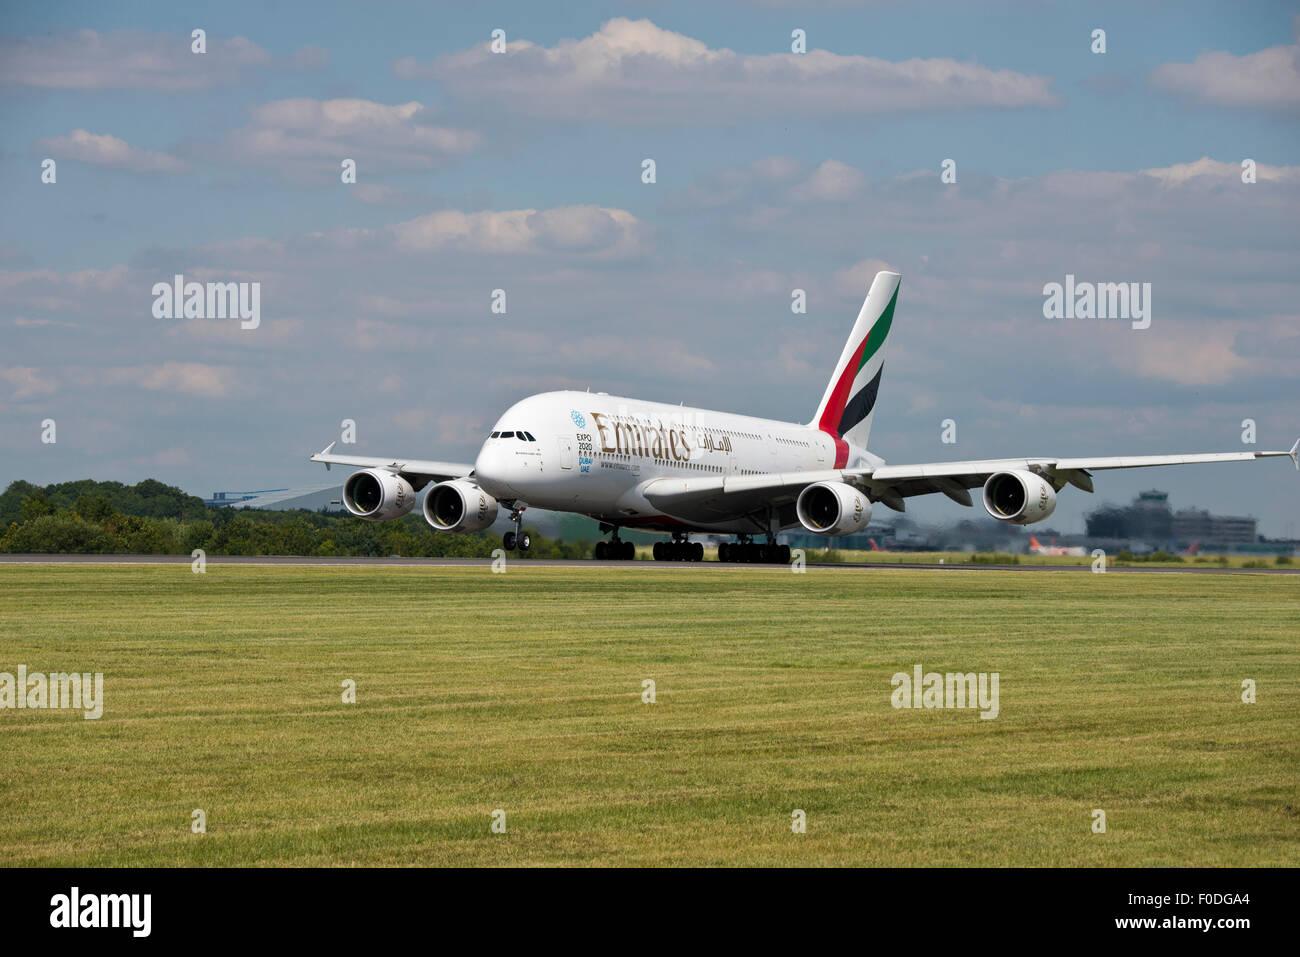 A380 EXPO 2020 Emirates Dubai UAE Manchester Airport England Uk Departure - Stock Image